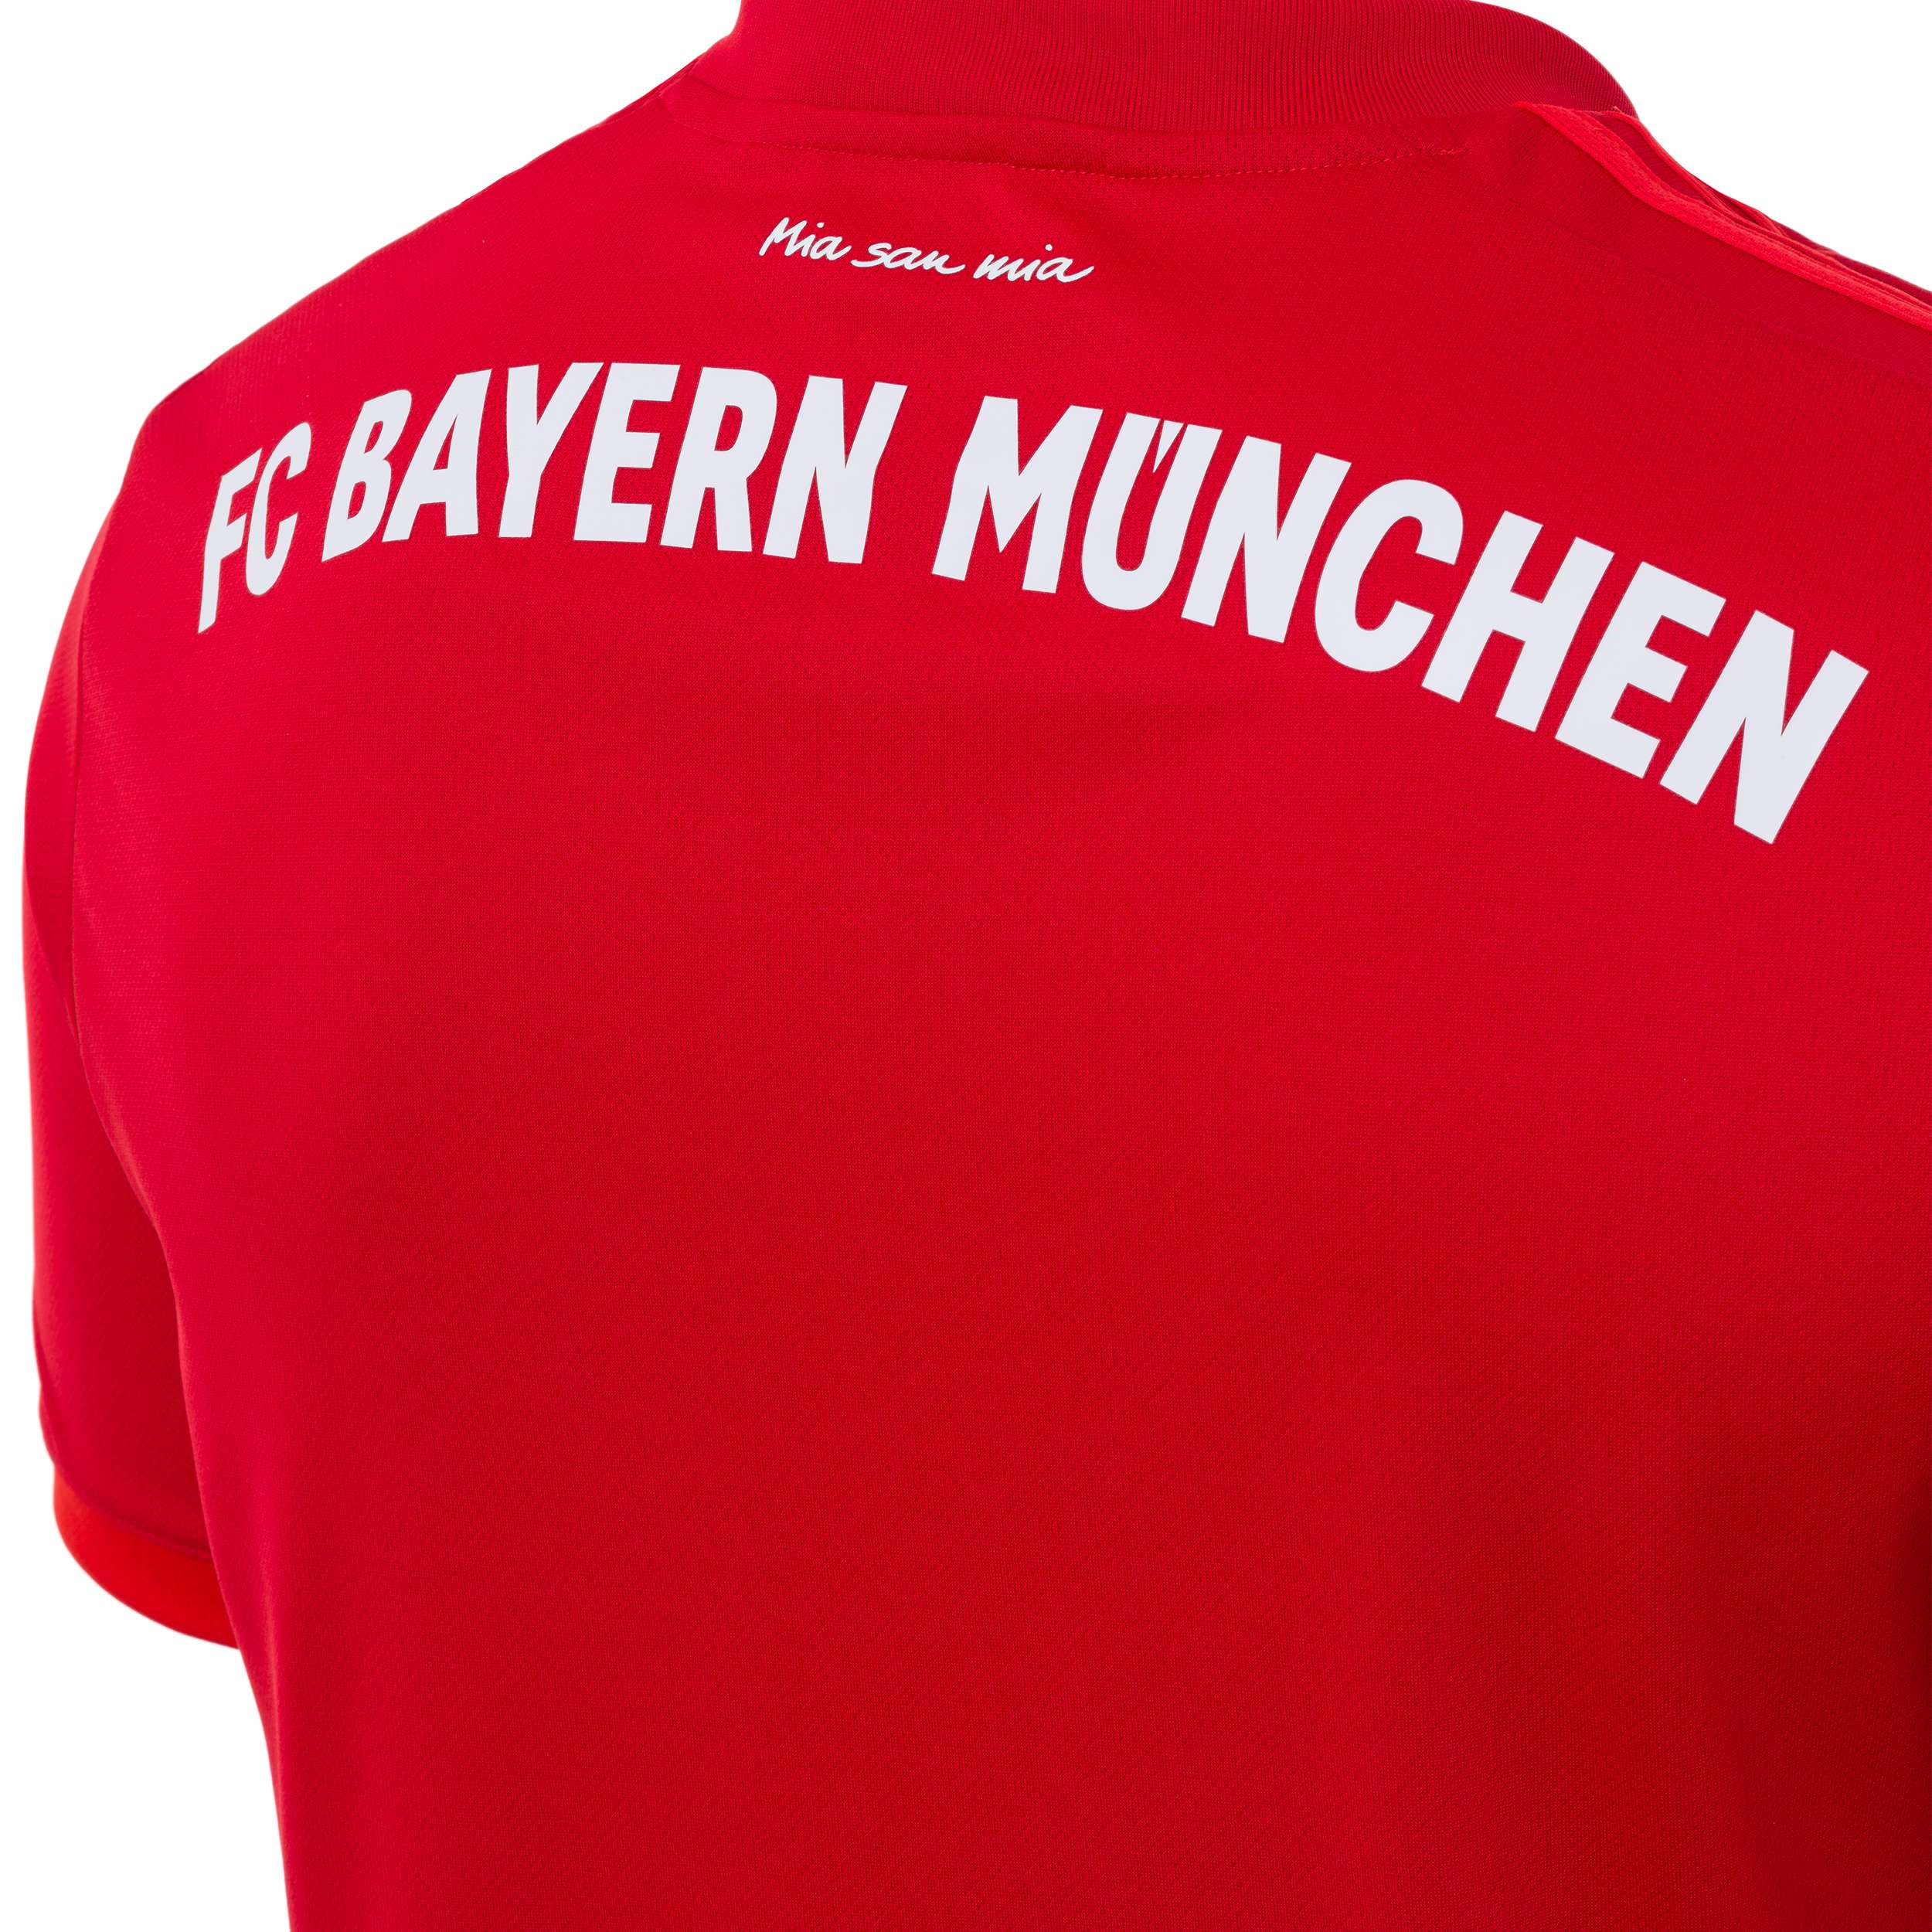 Bayern Munich 2019 20 Adidas Home Kit 19 20 Kits Football Shirt Blog